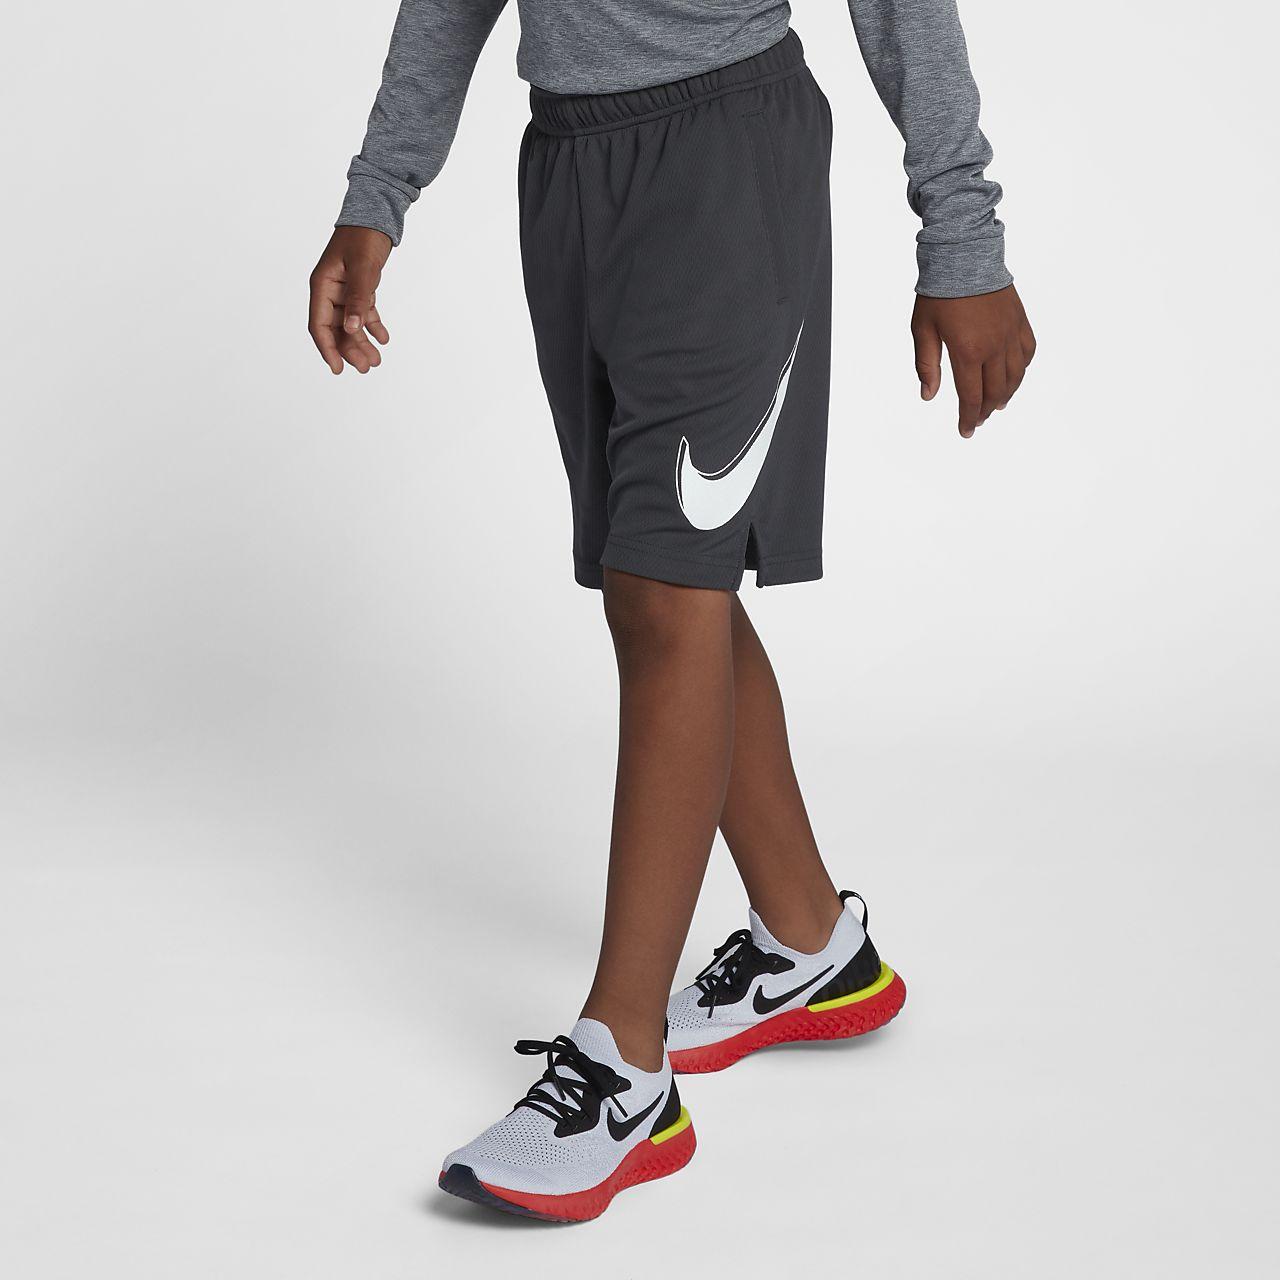 5 Dri Nike De 20 Pantalón Entrenamiento Cm Corto Fit Con Bdd0Fq